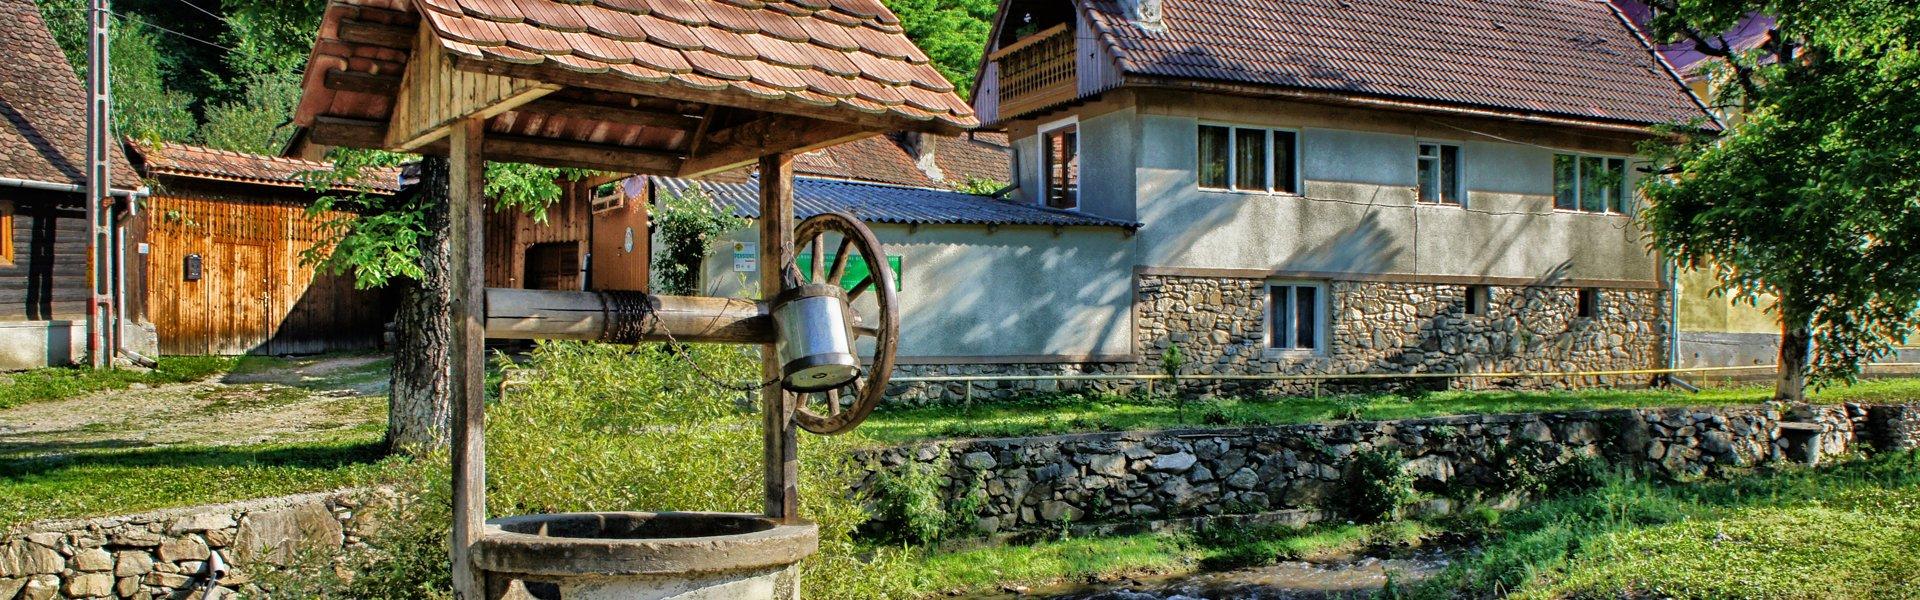 Sibiel in Roemenië